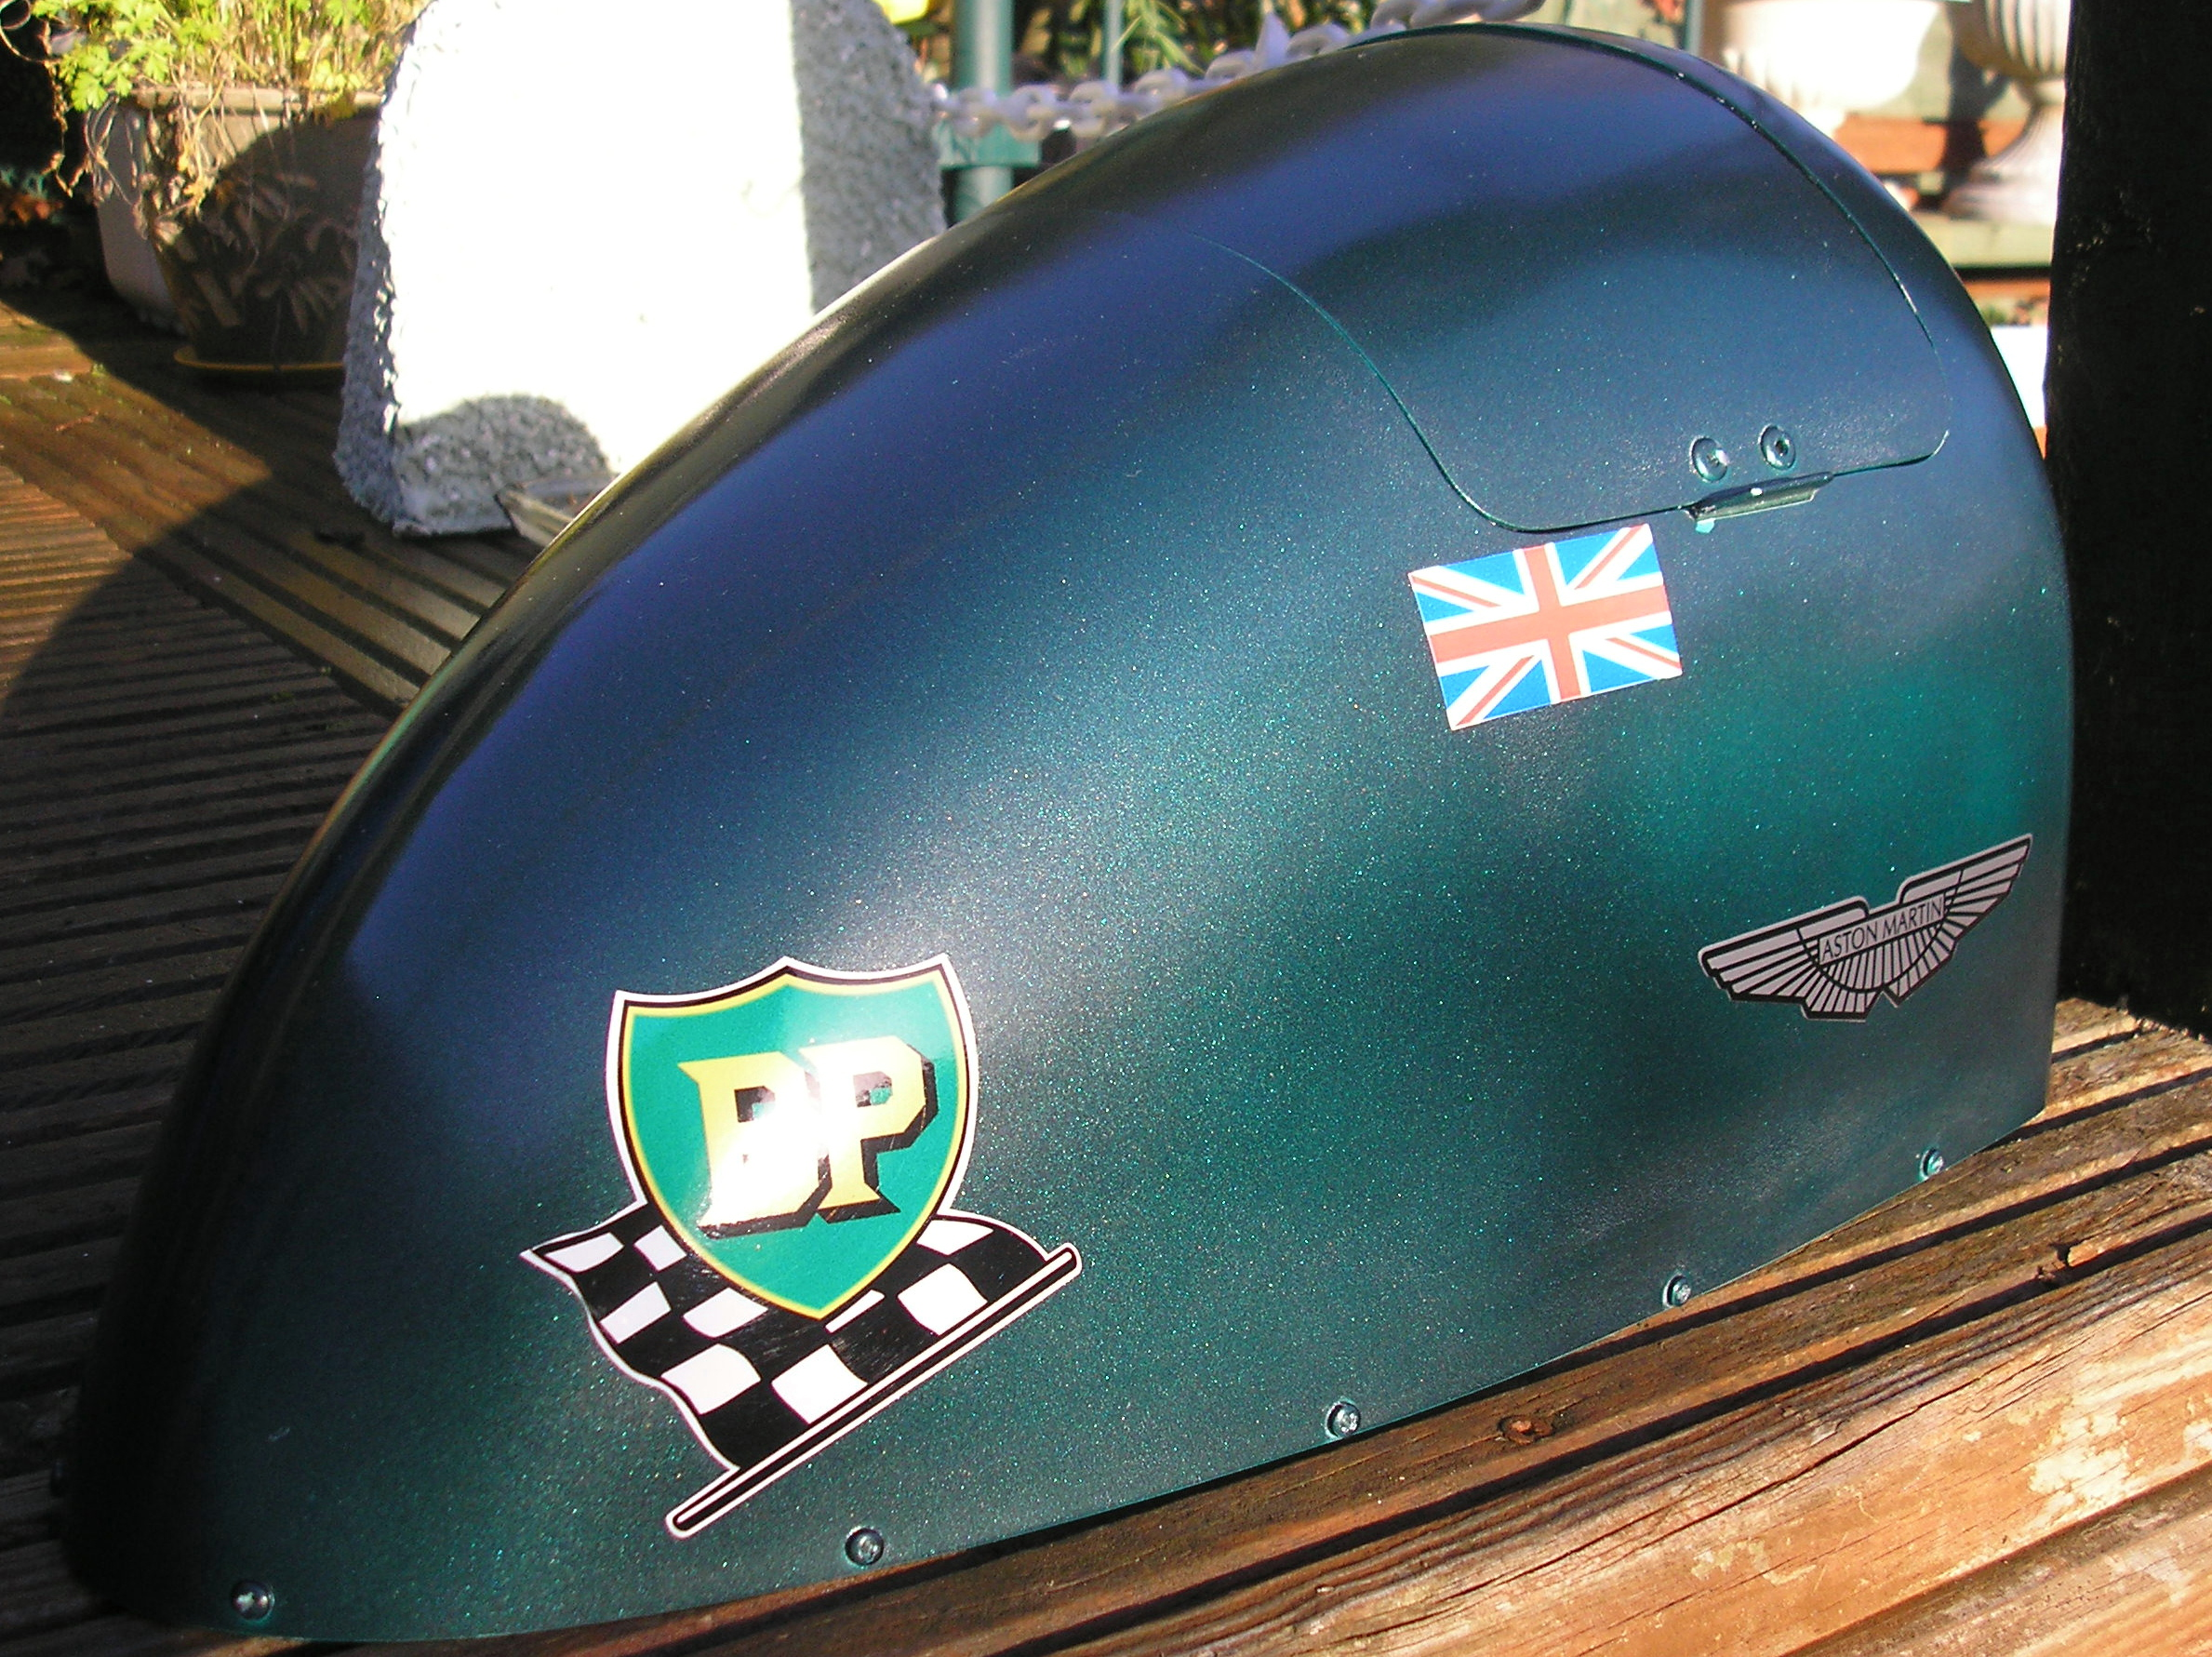 Cobra Kit Car >> headrest fairing | Classic & Vintage car parts at Raced ...